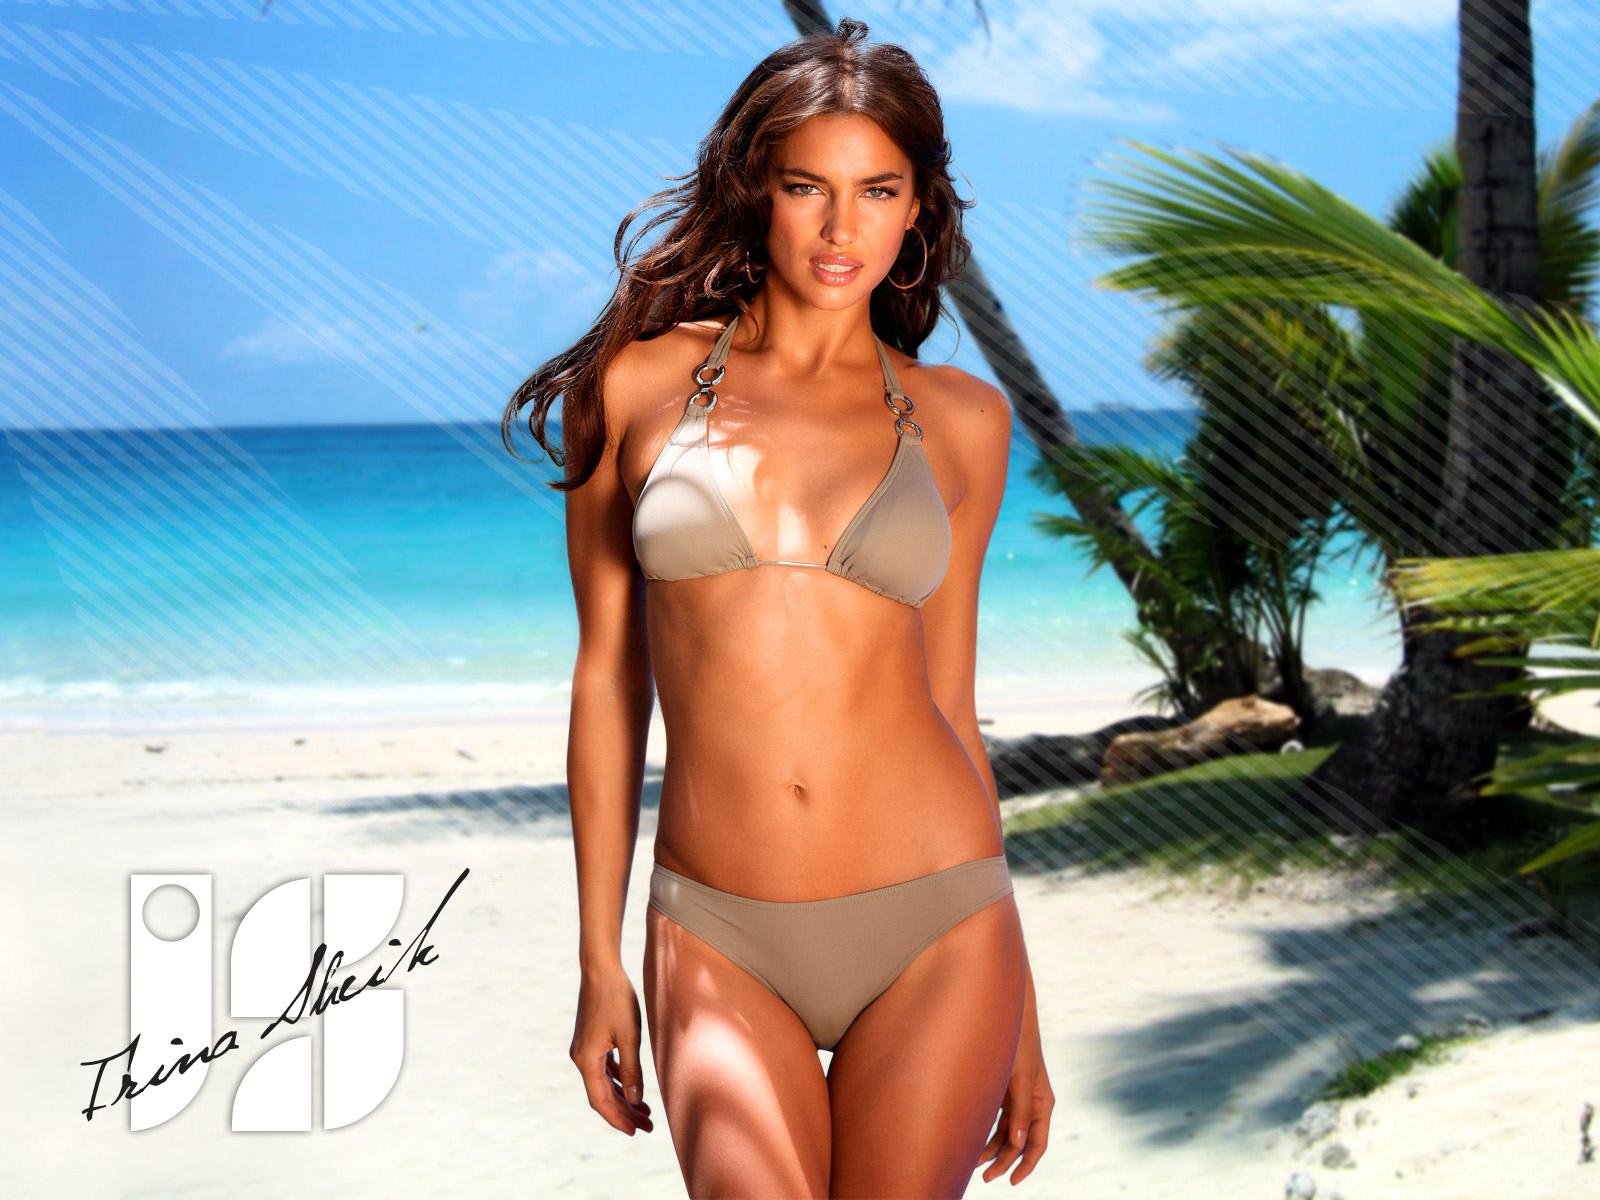 http://www.zastavki.com/pictures/1600x1200/2010/Girls_Models_Models_I_Seductive_Irina_Sheik_022713_.jpg